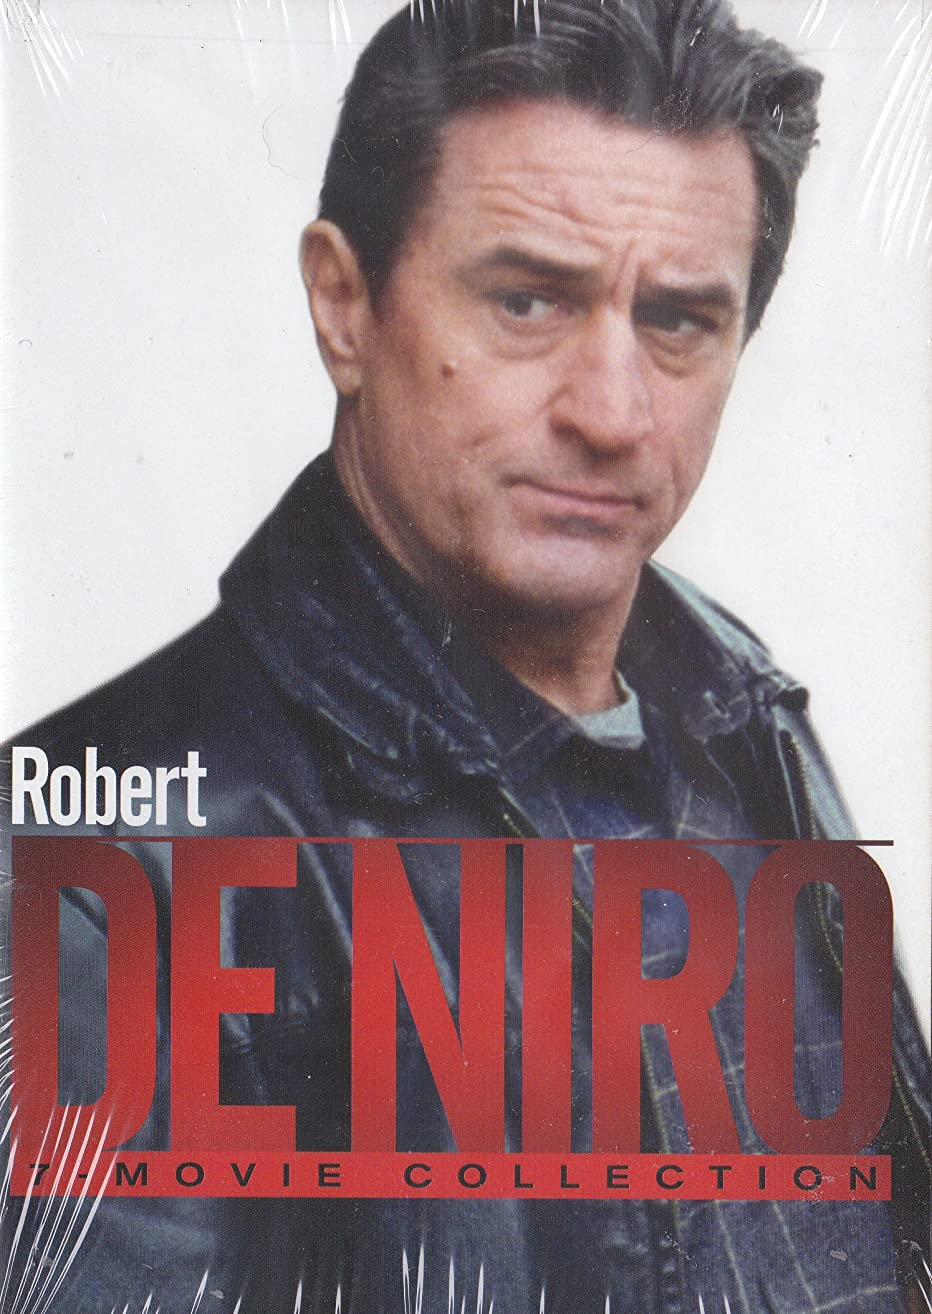 Robert De Niro 7 Movie Collection (Raging Bull, Ronin, Men of Honor, Stanley & Iris, True Confessions, Flawless, New York, New York) (DVD) (2011)